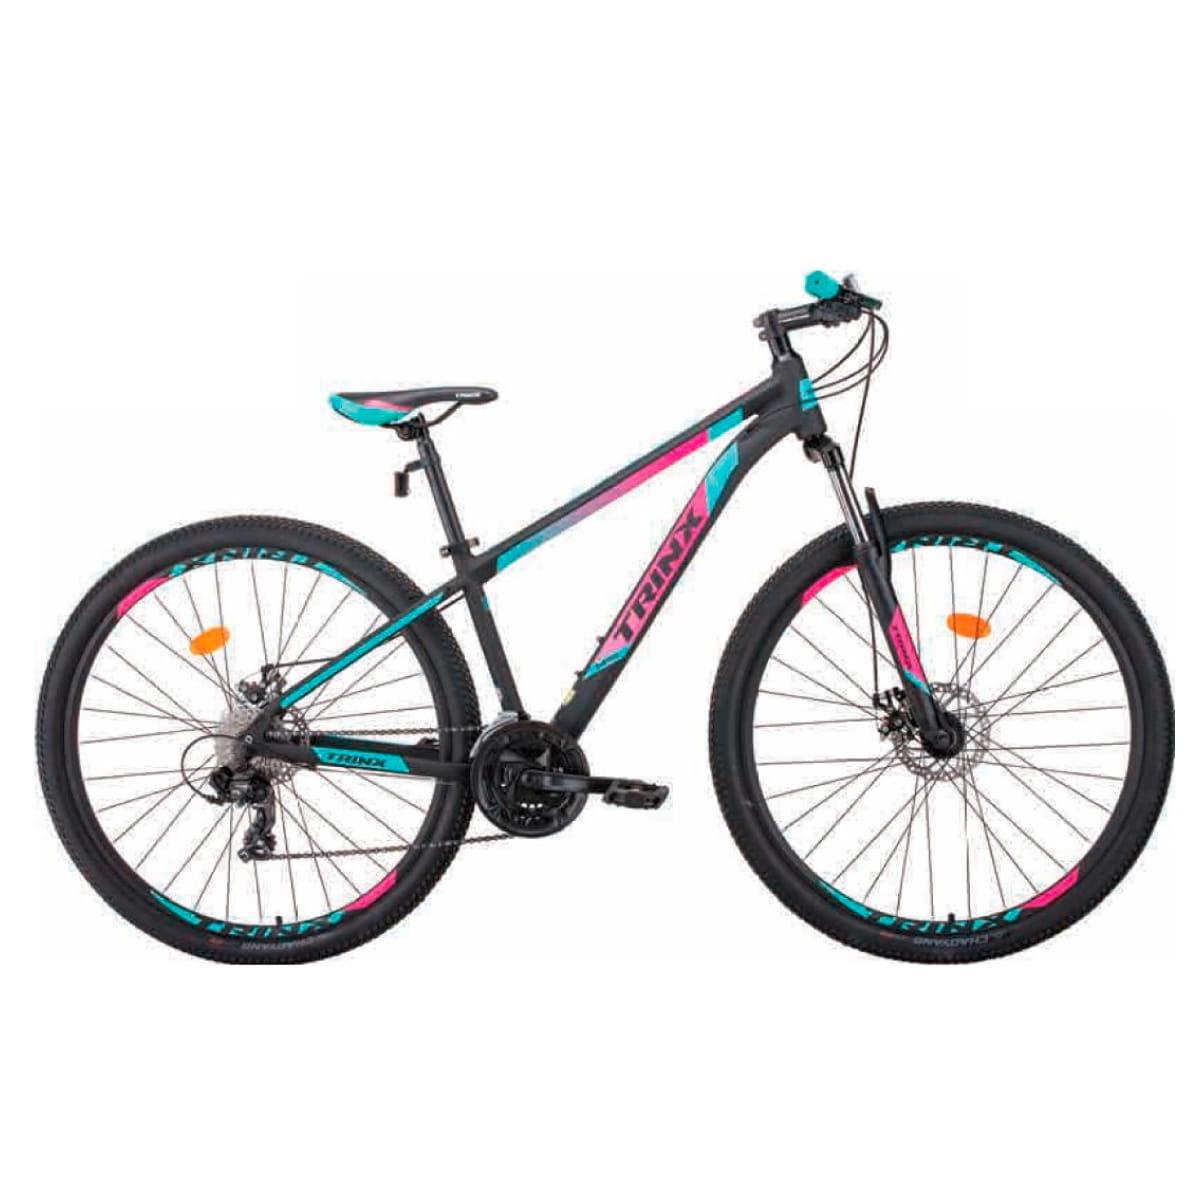 Bike Trinx M100 Max 2020 24v Shimano Preto Roxo